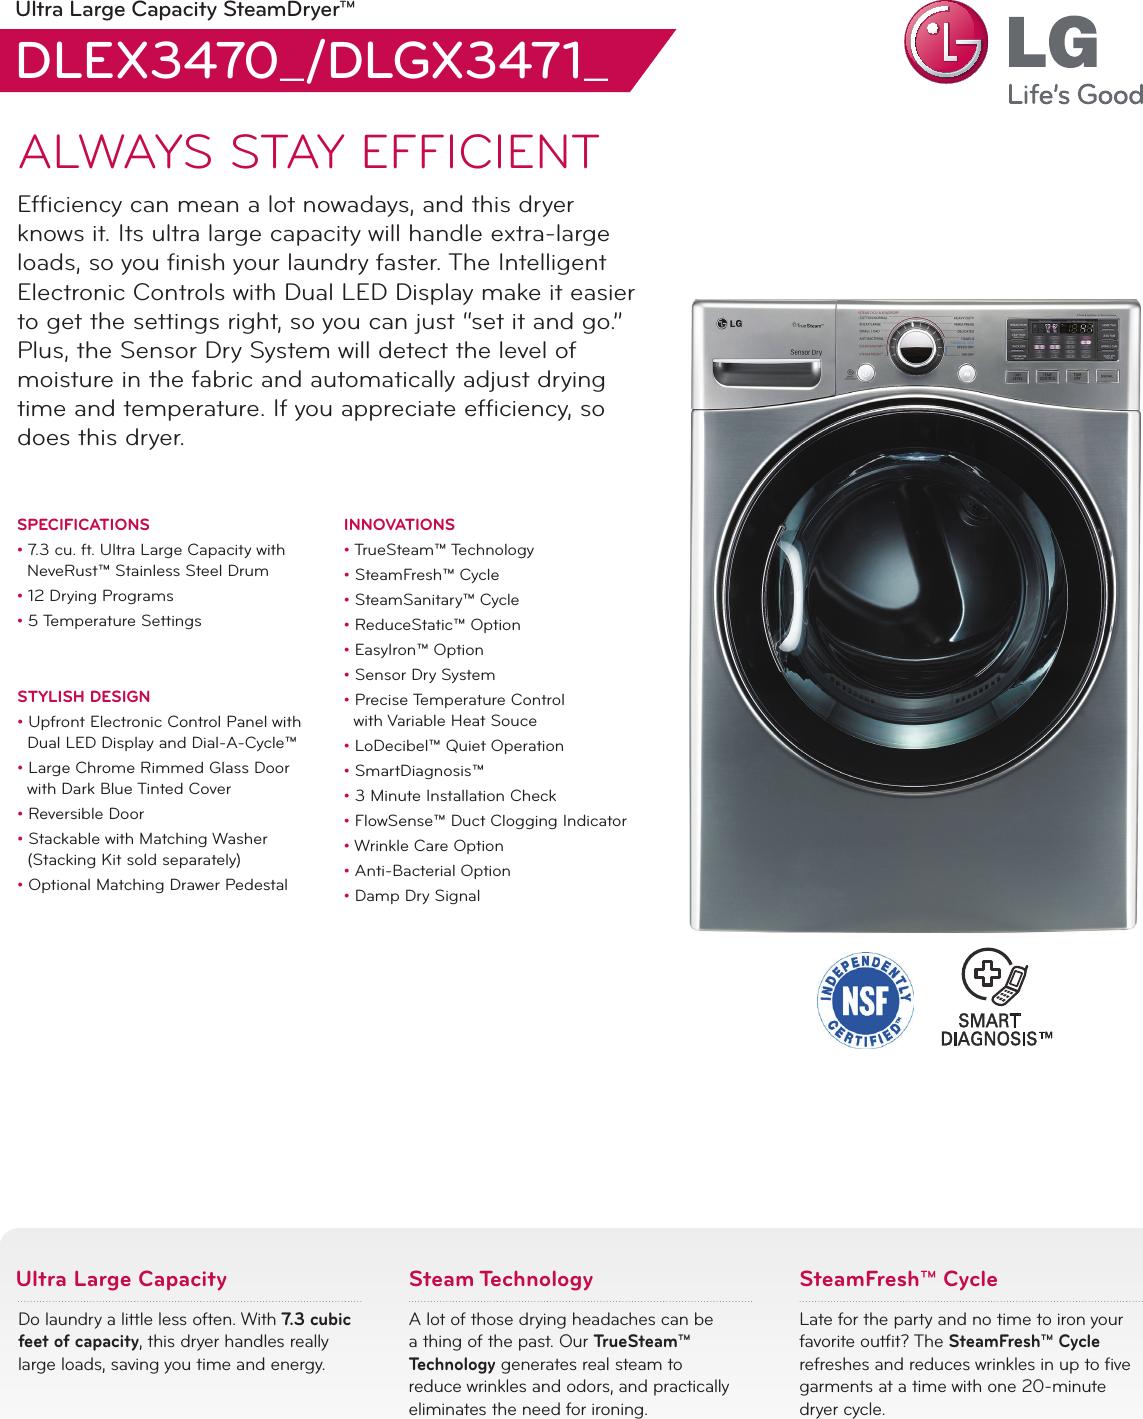 LG DLEX3470W User Manual Specification DLEX3470 DLGX3471 Dryer Spec